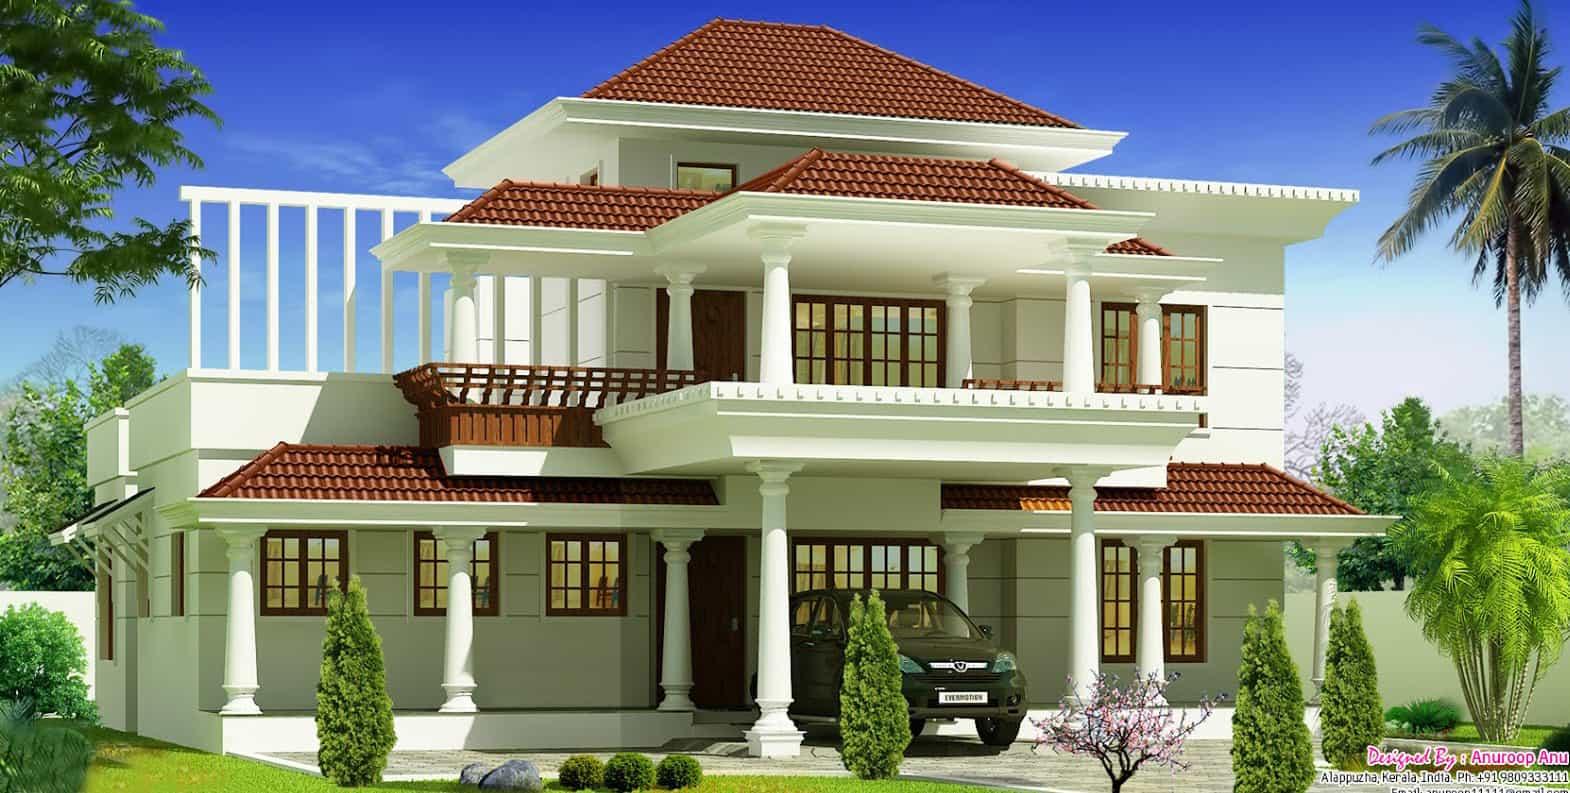 4bhk house plans keralahouseplanner